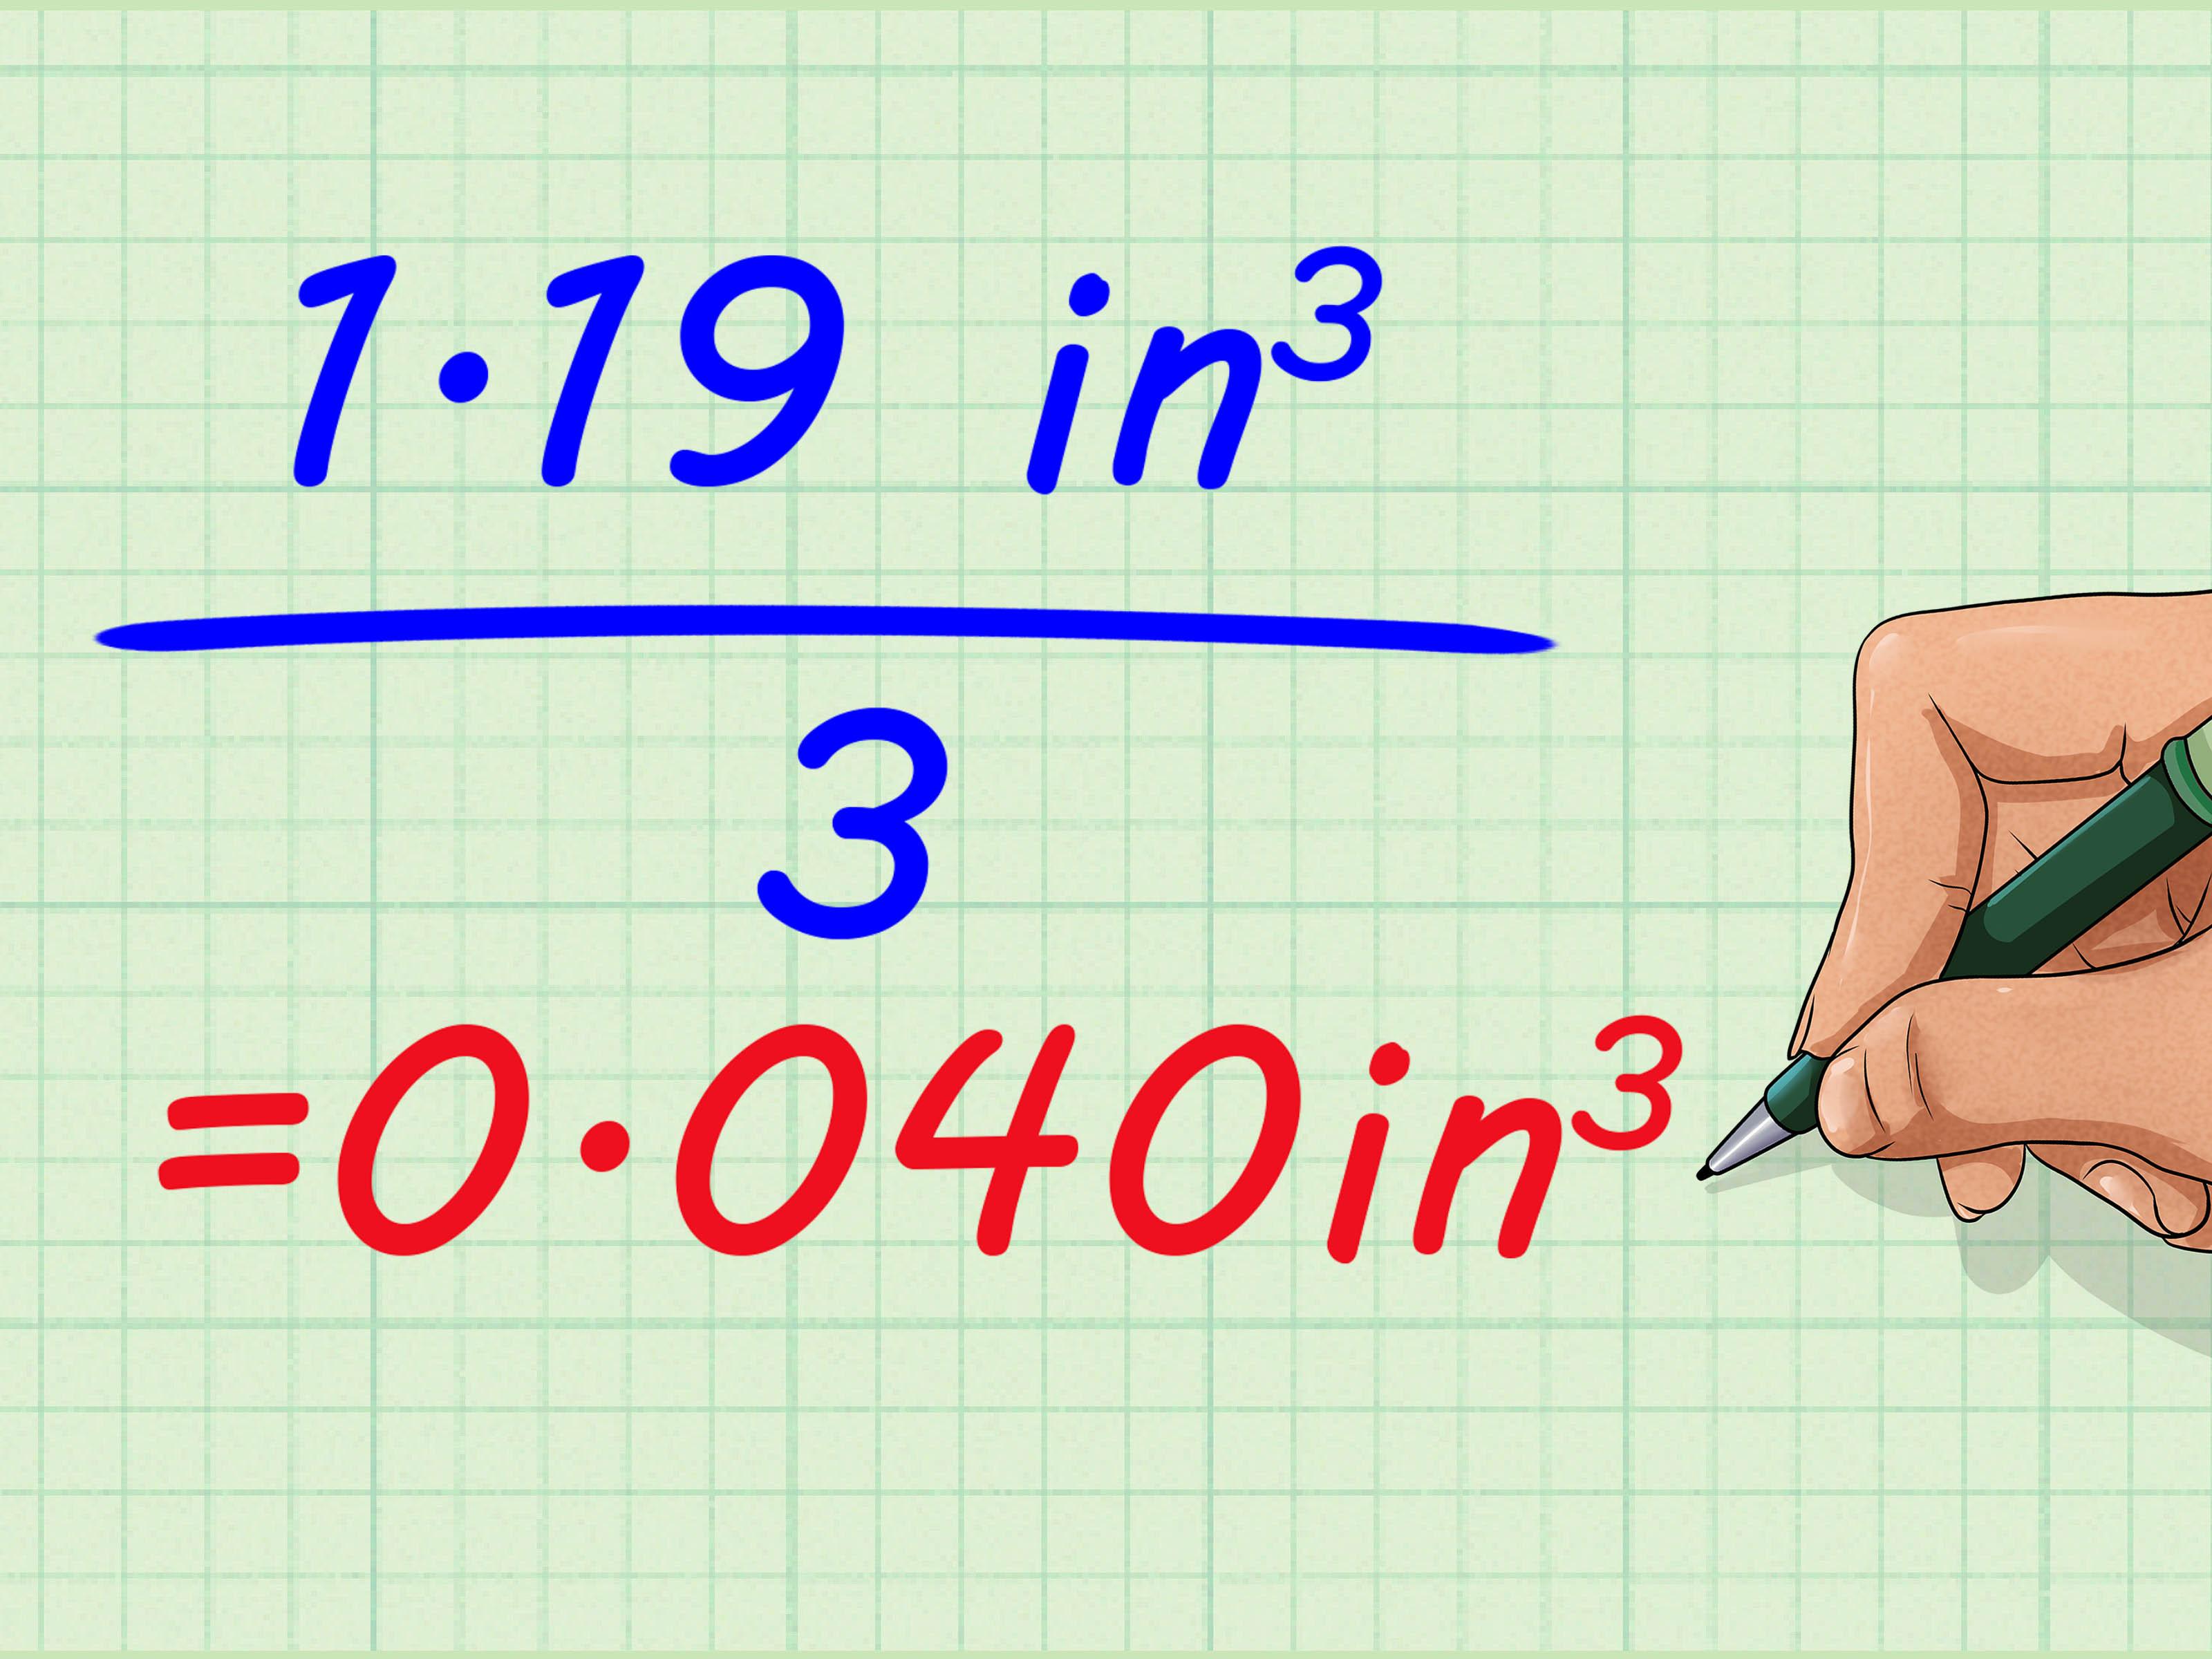 How To Calculate Radius Of A Circle Radius Of A Circle Calculator With  Points Calculate